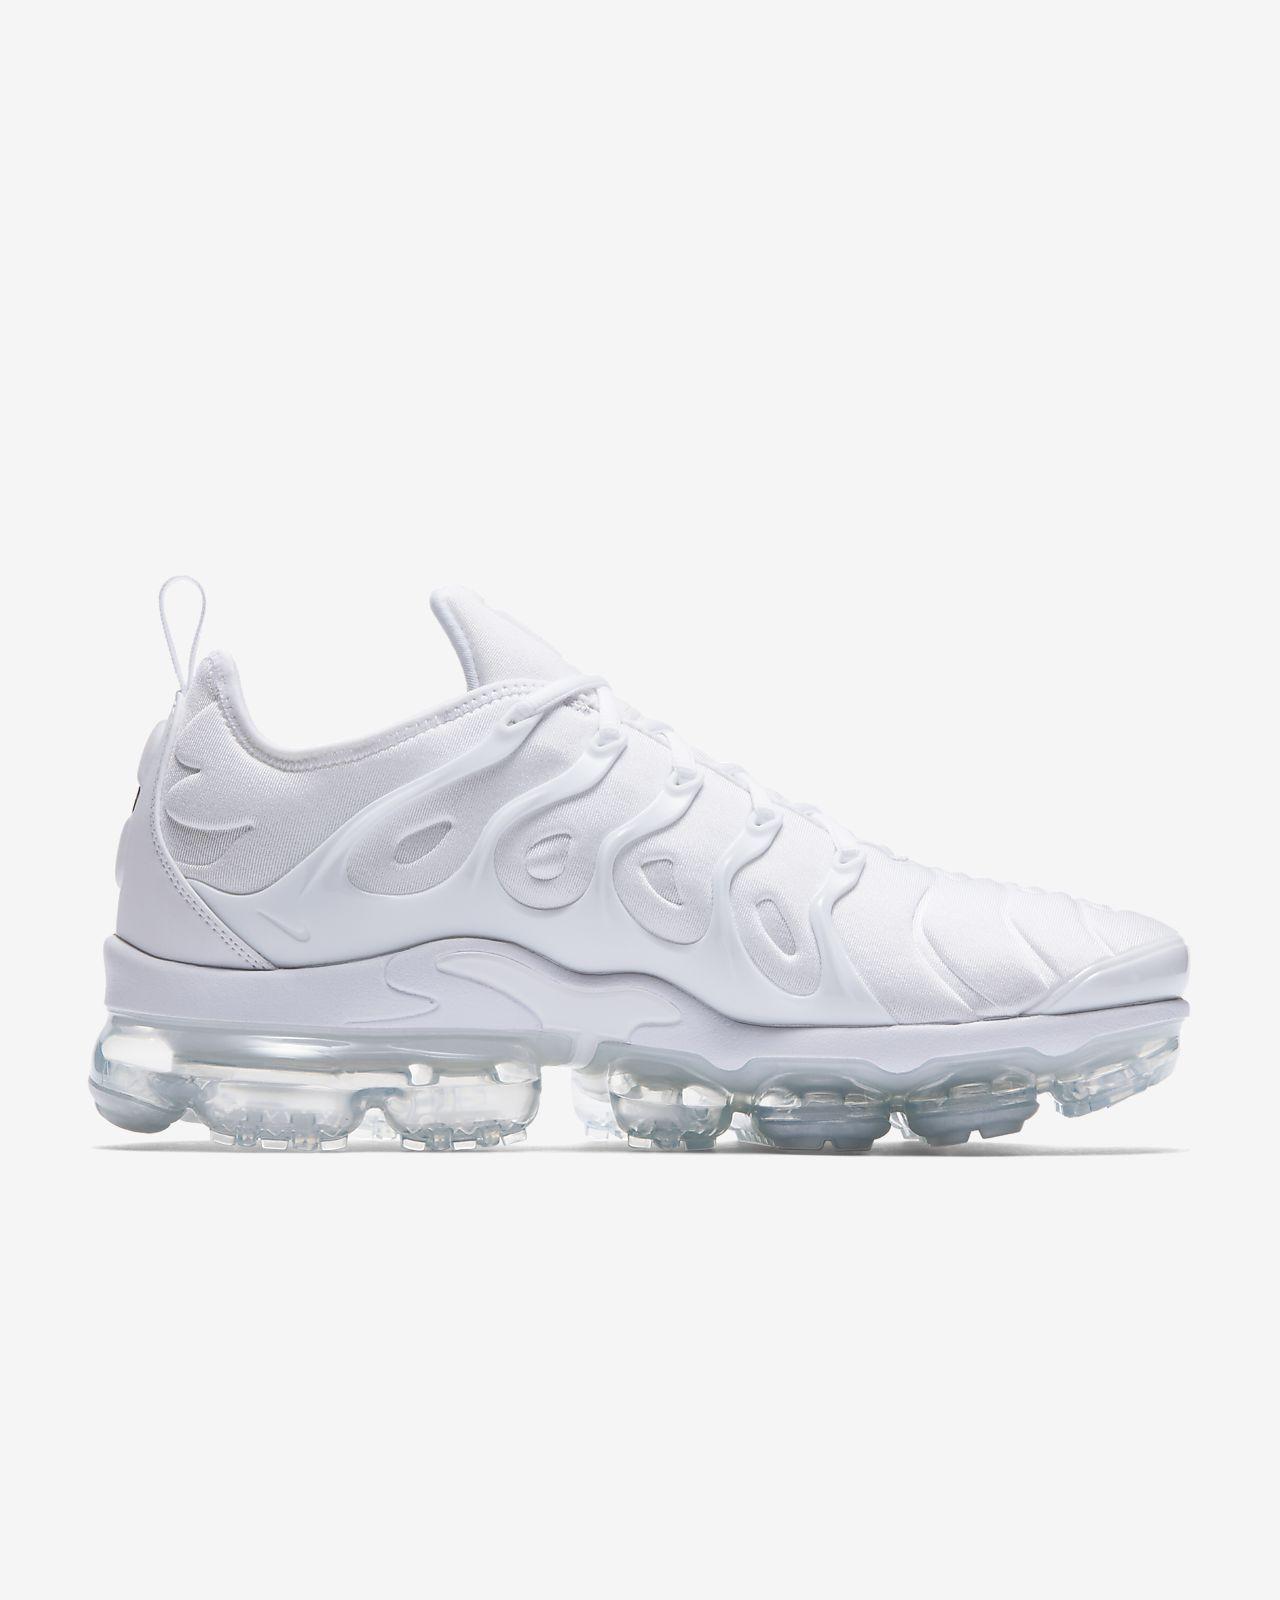 c3a86ae1d1 Nike Air VaporMax Plus Men's Shoe. Nike.com PT